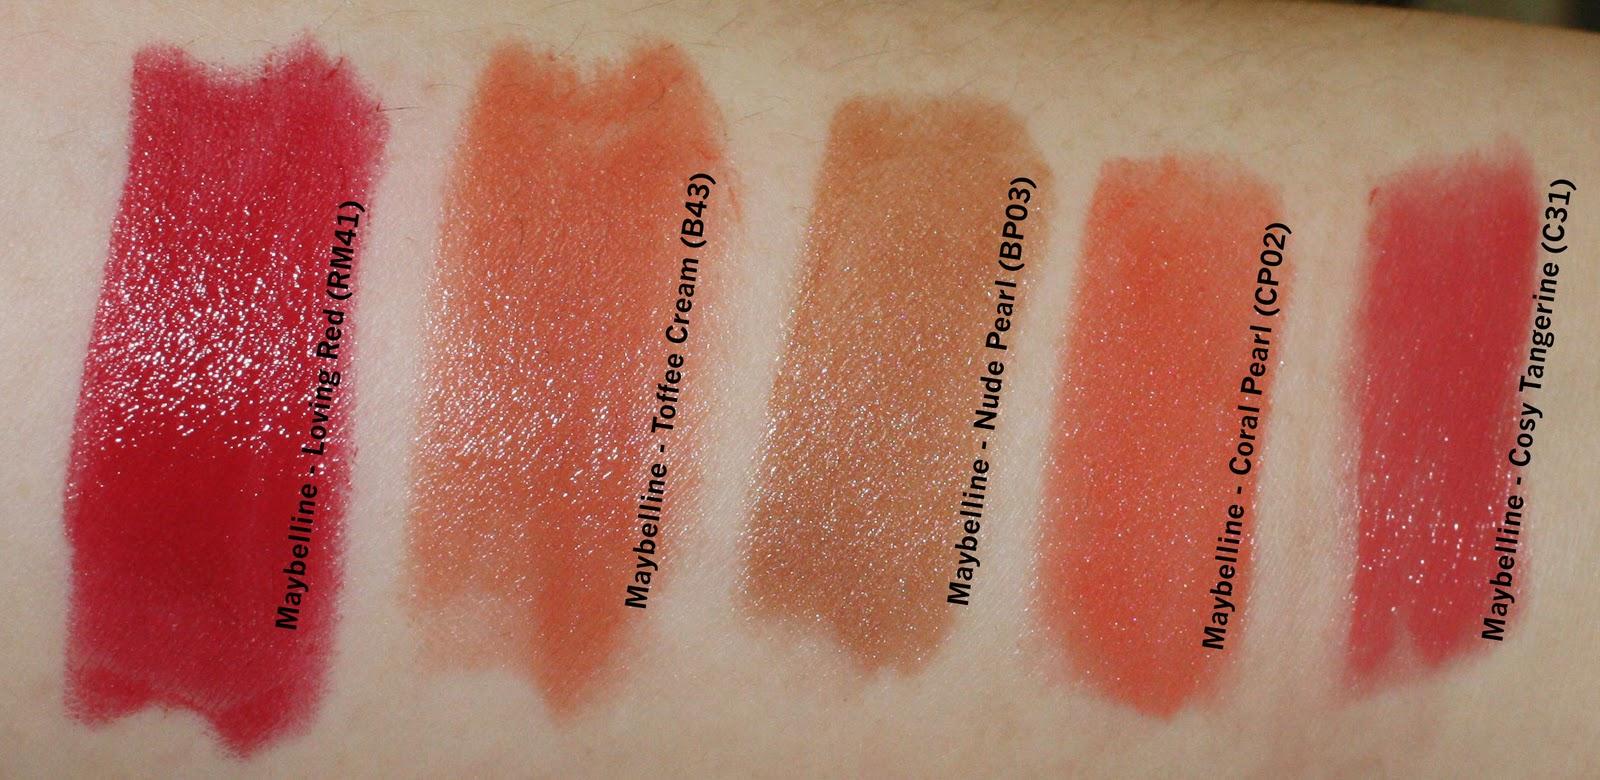 Revlon Mauve Lipstick Drugstore lipsticksRevlon Mystic Mauve Lipstick